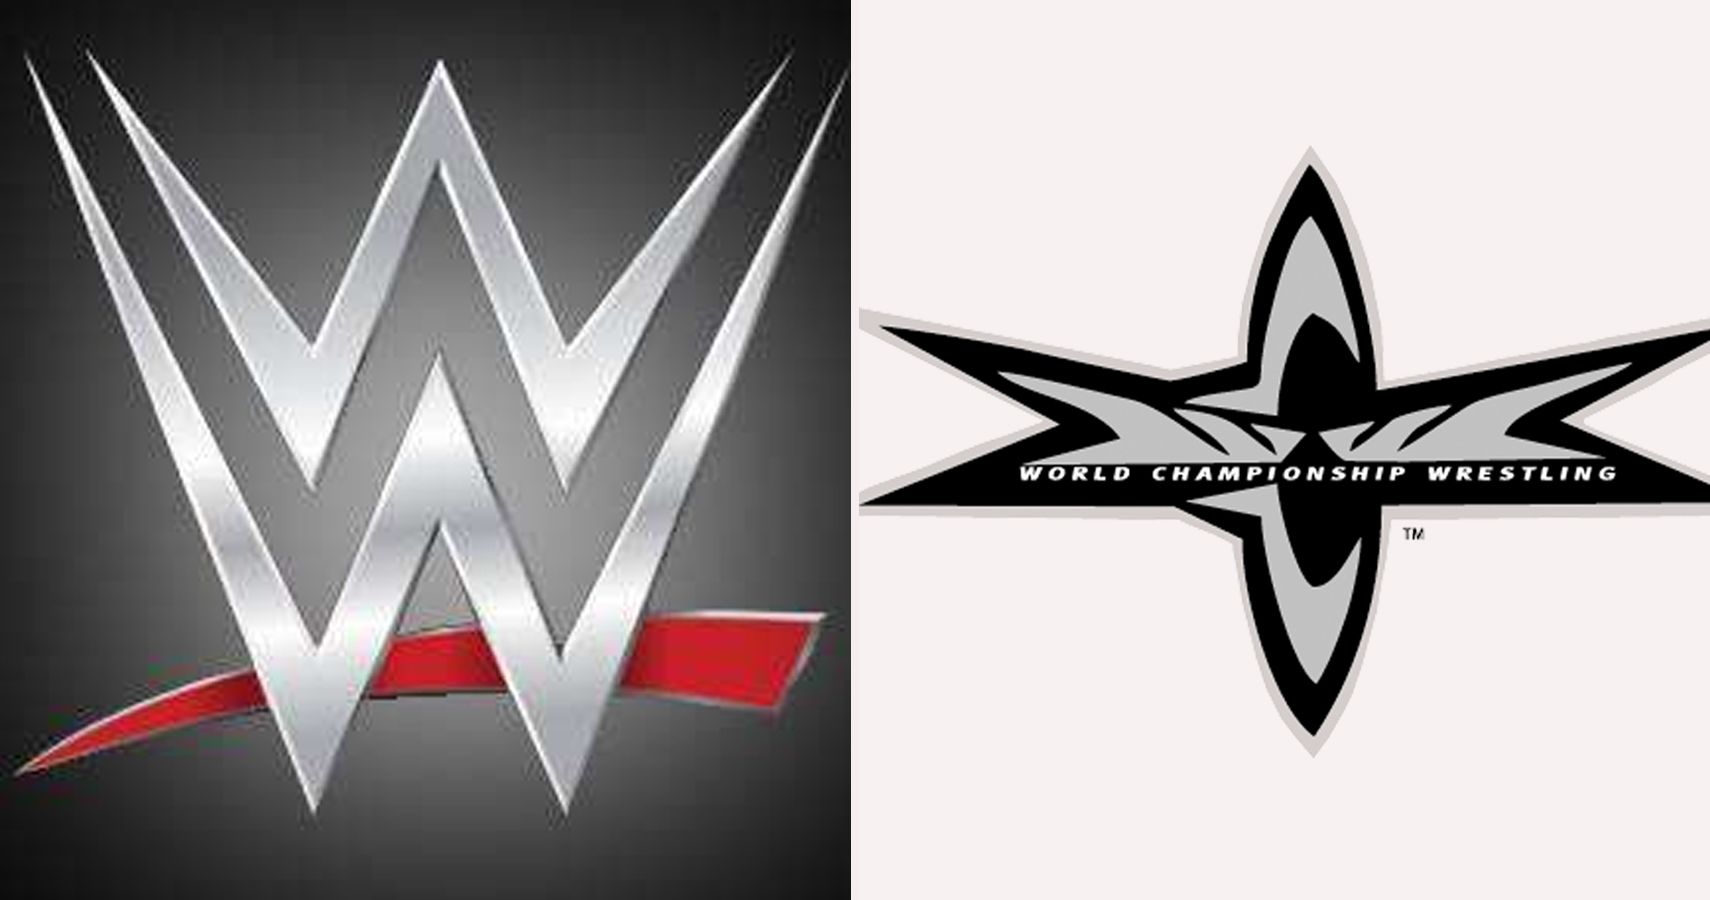 Former WWE & WCW Star Tom Zenk Dies Shockingly At 59